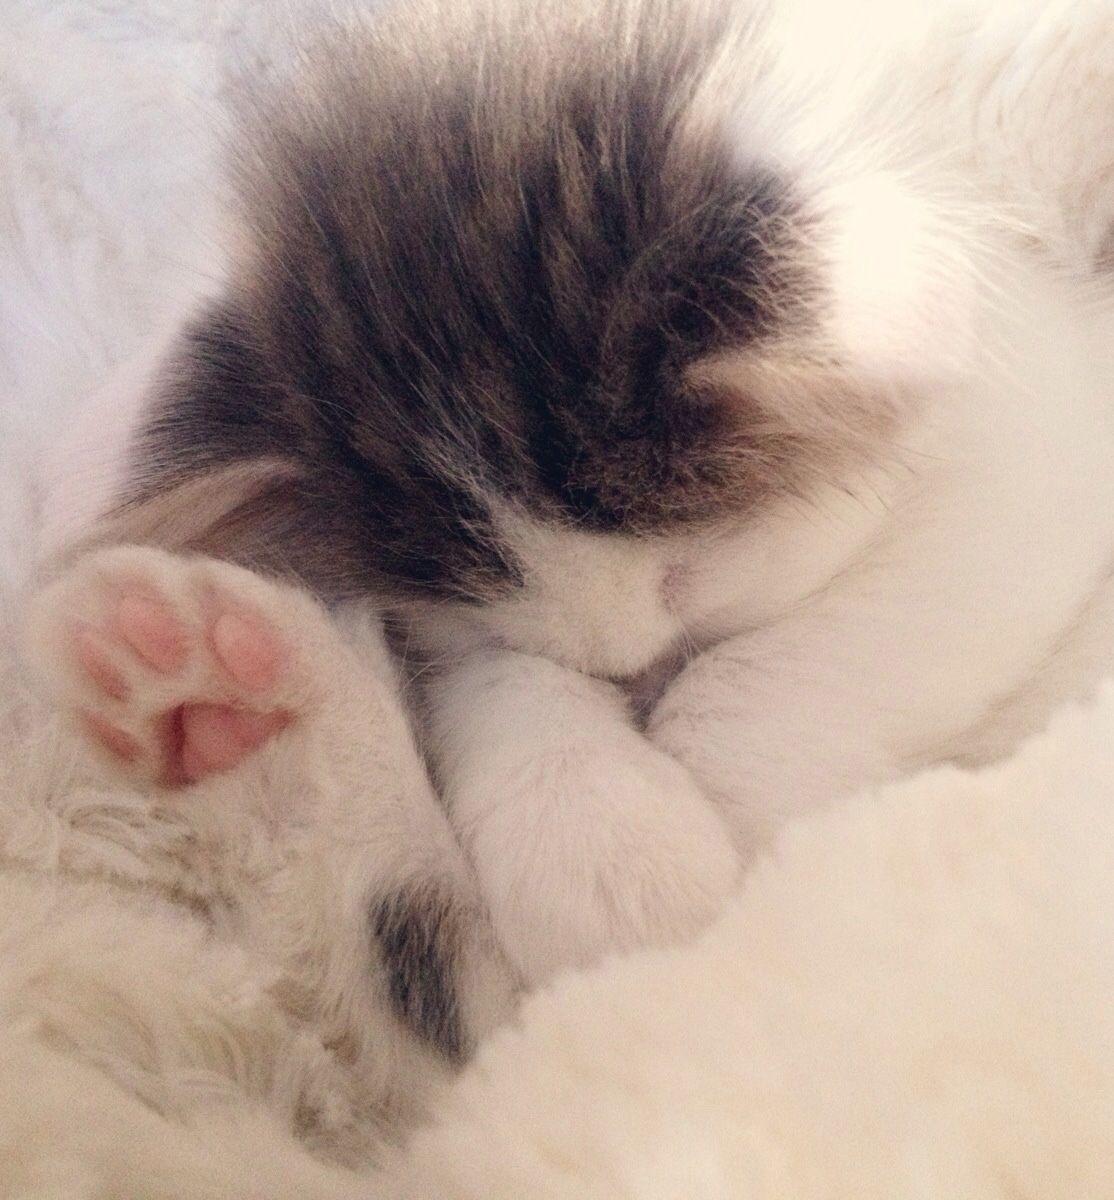 Zzzzz Kitty Sleeping Kitten Cat Sleeping Cute Cats And Kittens